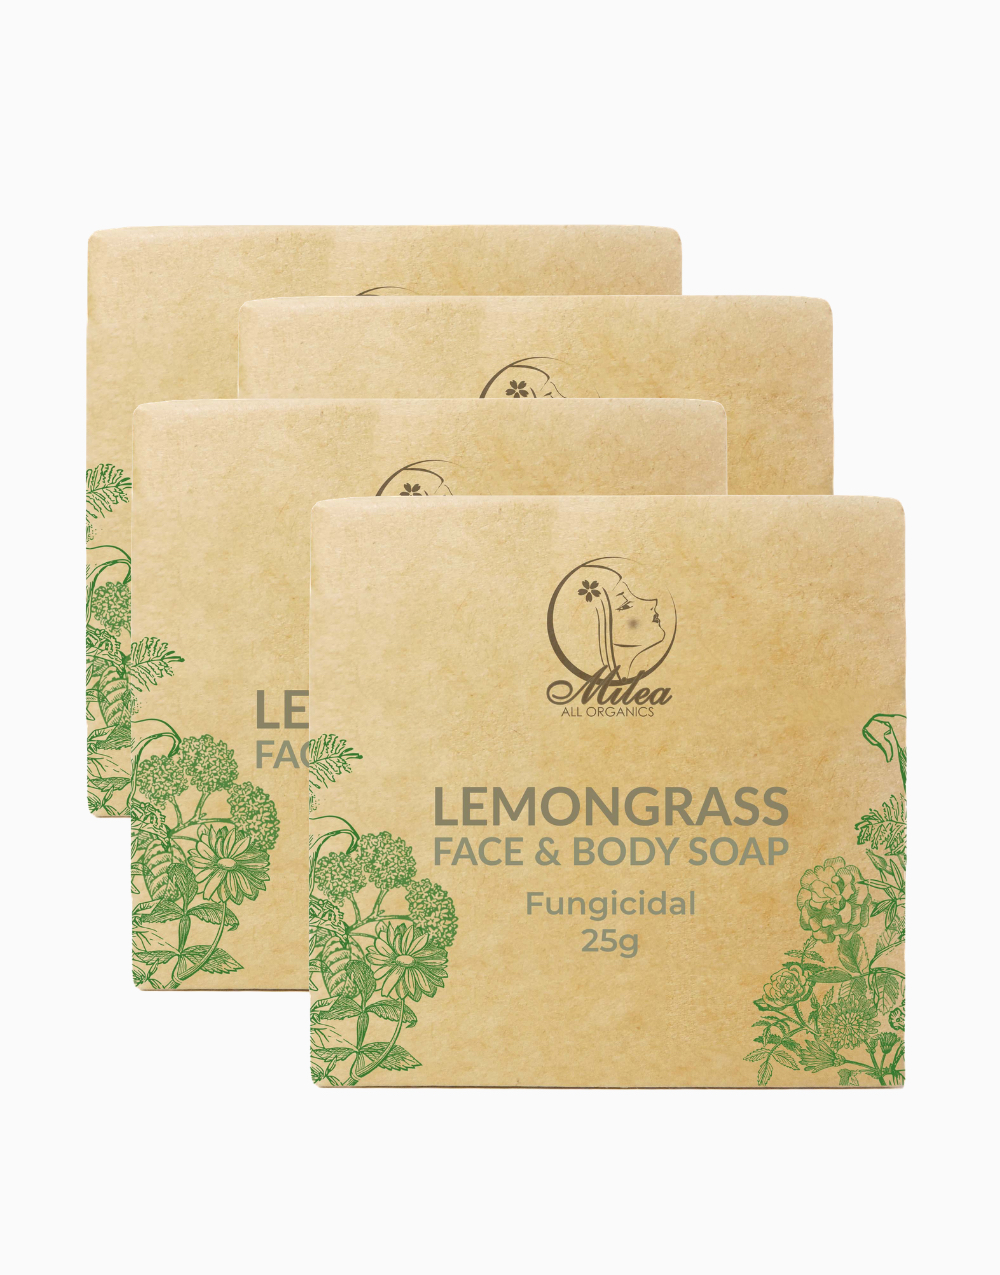 All Organics Lemongrass Soap (25g) (4 Pcs.) by Milea